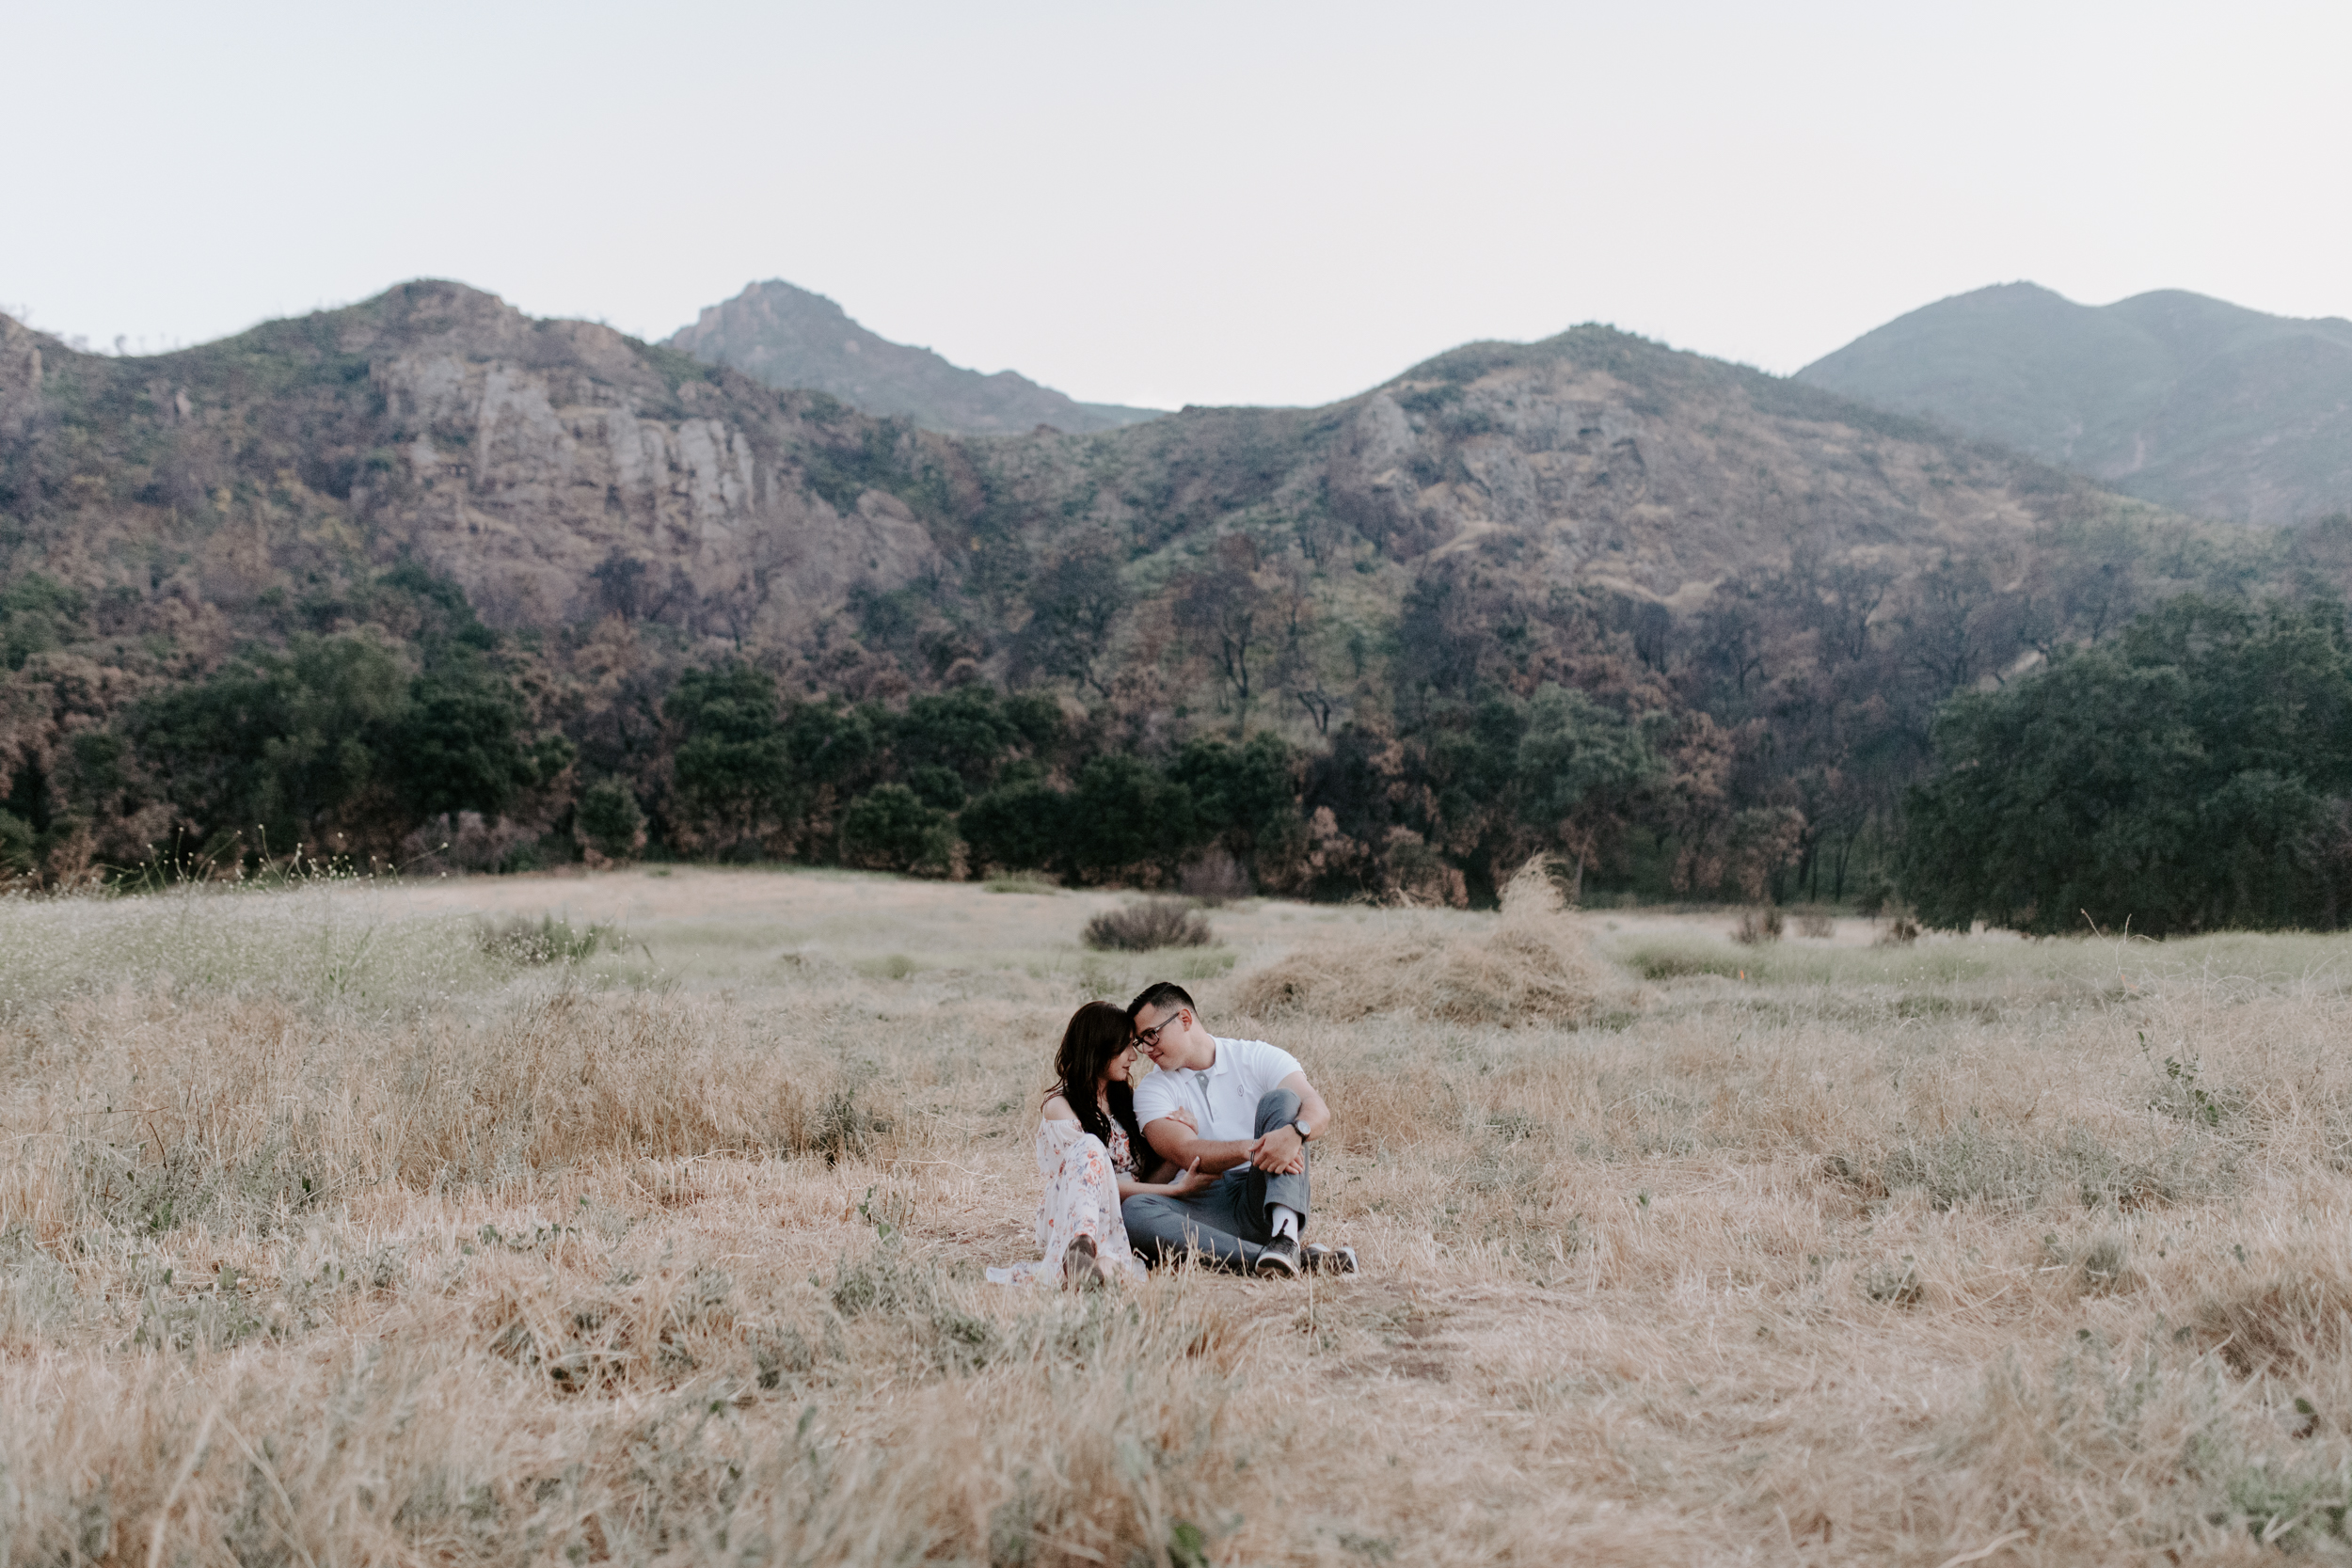 Katelyn Faye Photography | www.katelynfaye.com | Las Vegas Wedding Photographer | Malibu Creek State Park Engagements | J&N (33 of 33).jpg